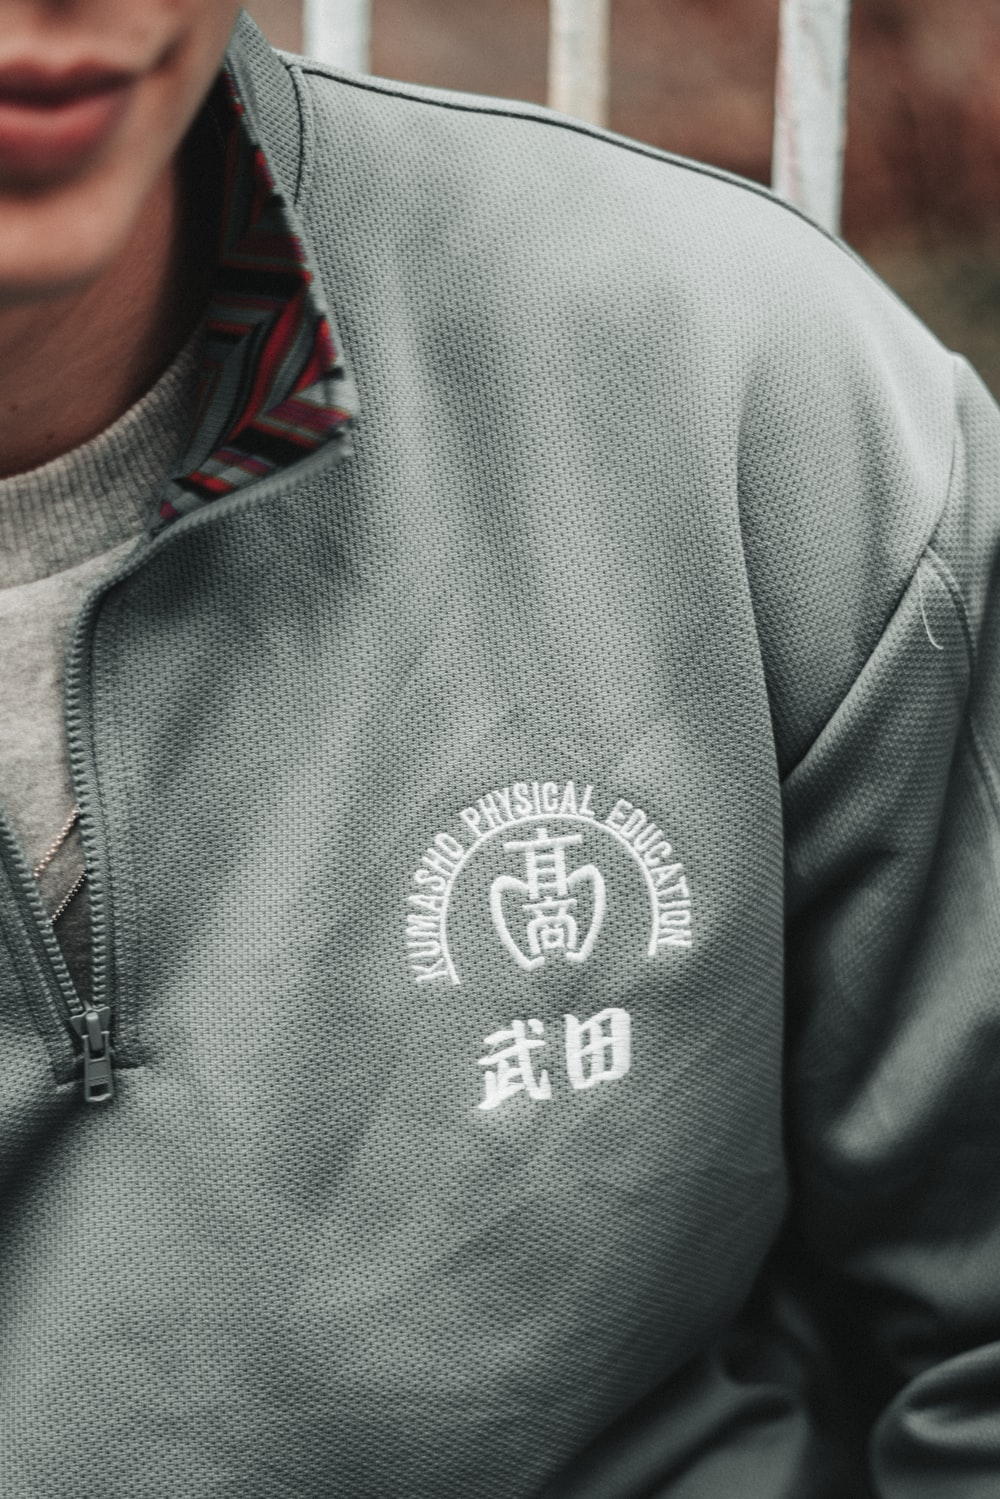 man in gray zip up hoodie